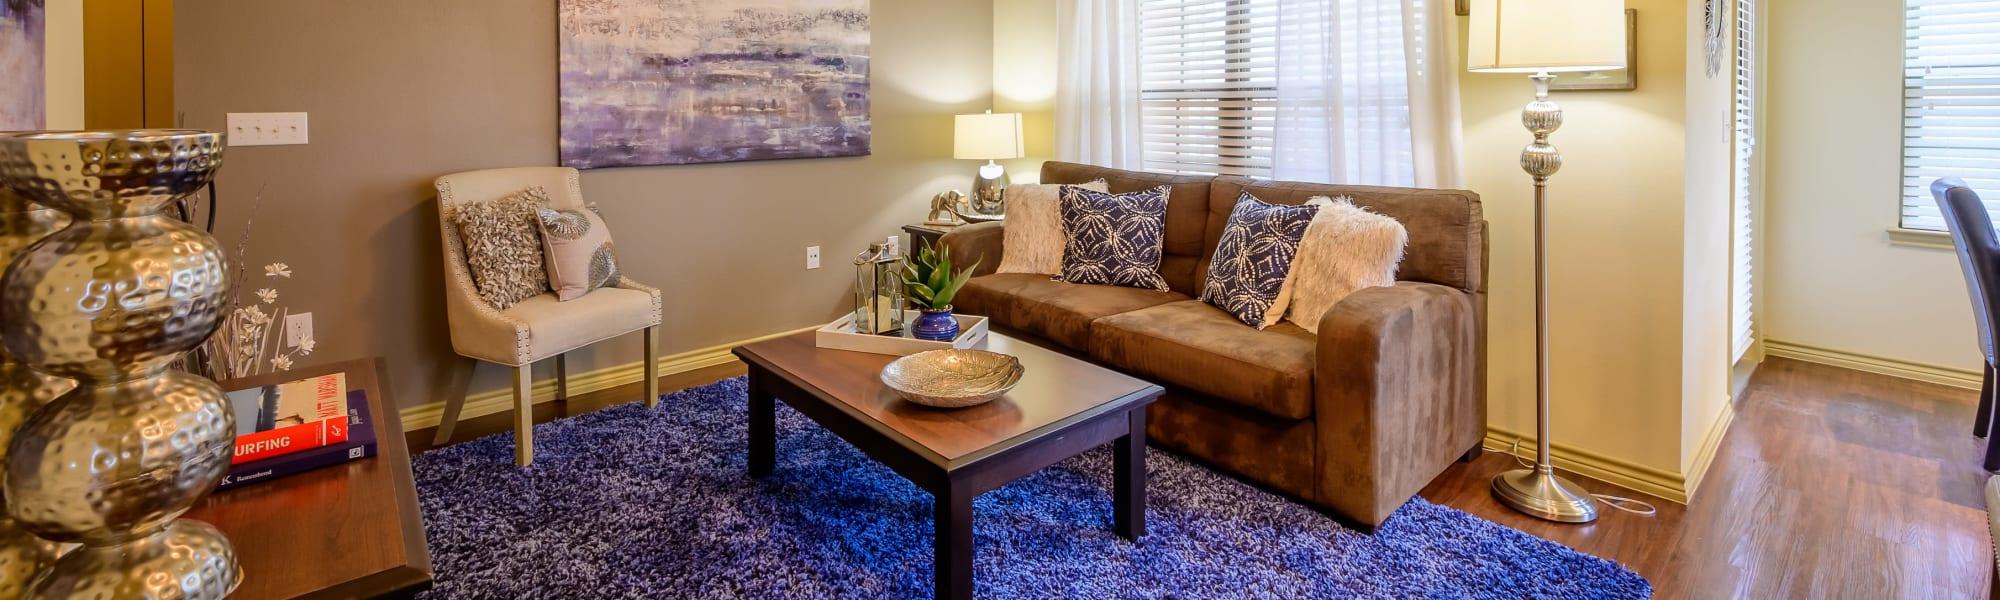 Floor plans at Pecan Springs Apartments in San Antonio, Texas